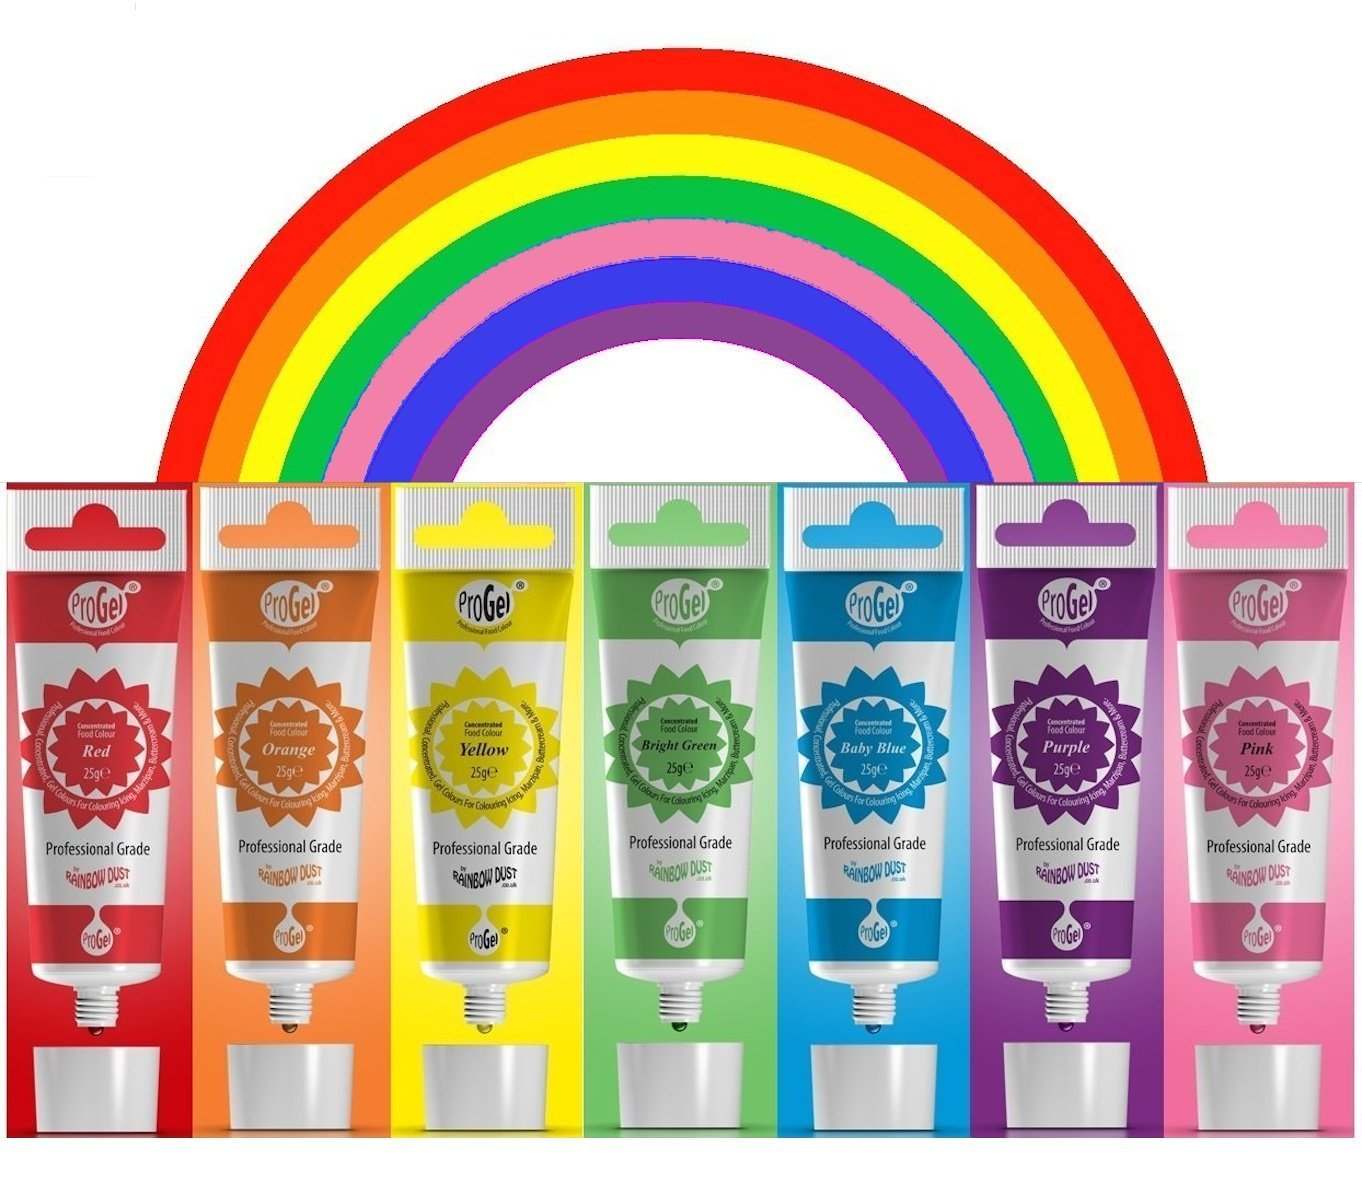 RAINBOW Dust ProGel Icing Colour Paste Gel Food Colouring Sugarcraft Set - 7 PK by Rainbow Dust (Image #1)